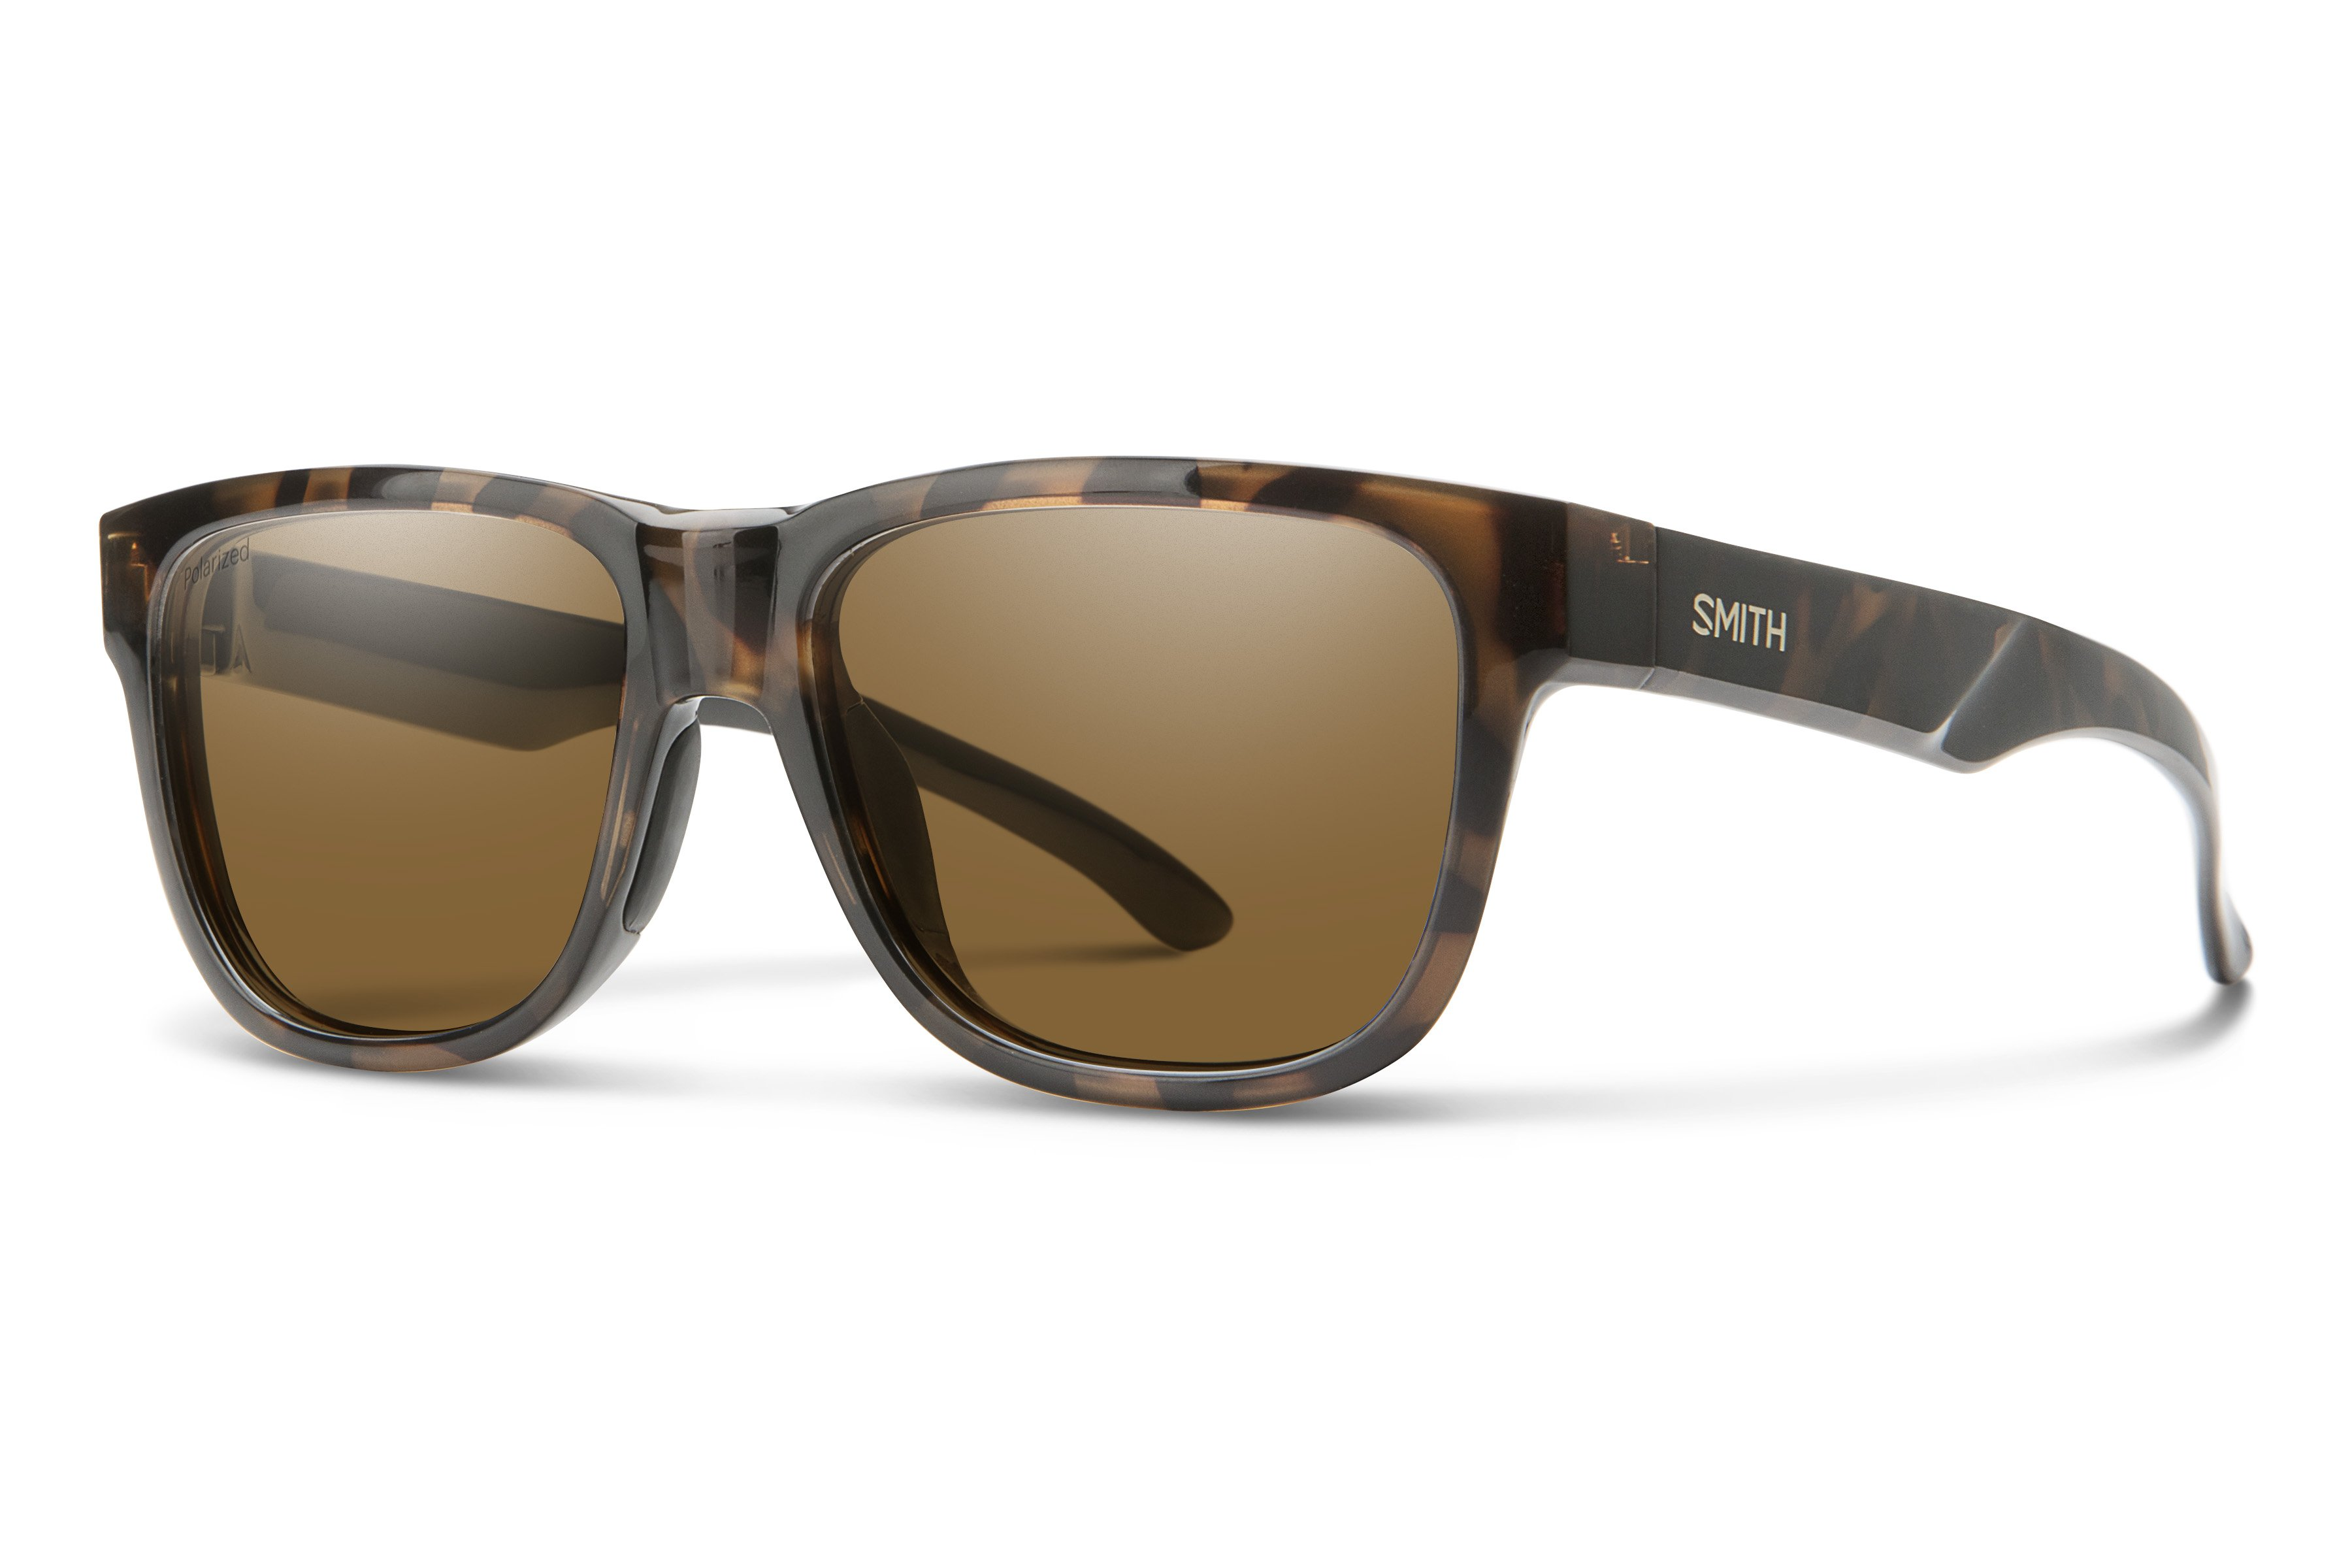 Smith Optics Challis Designer Sunglasses in Matte Tortoise with Polarized Brown